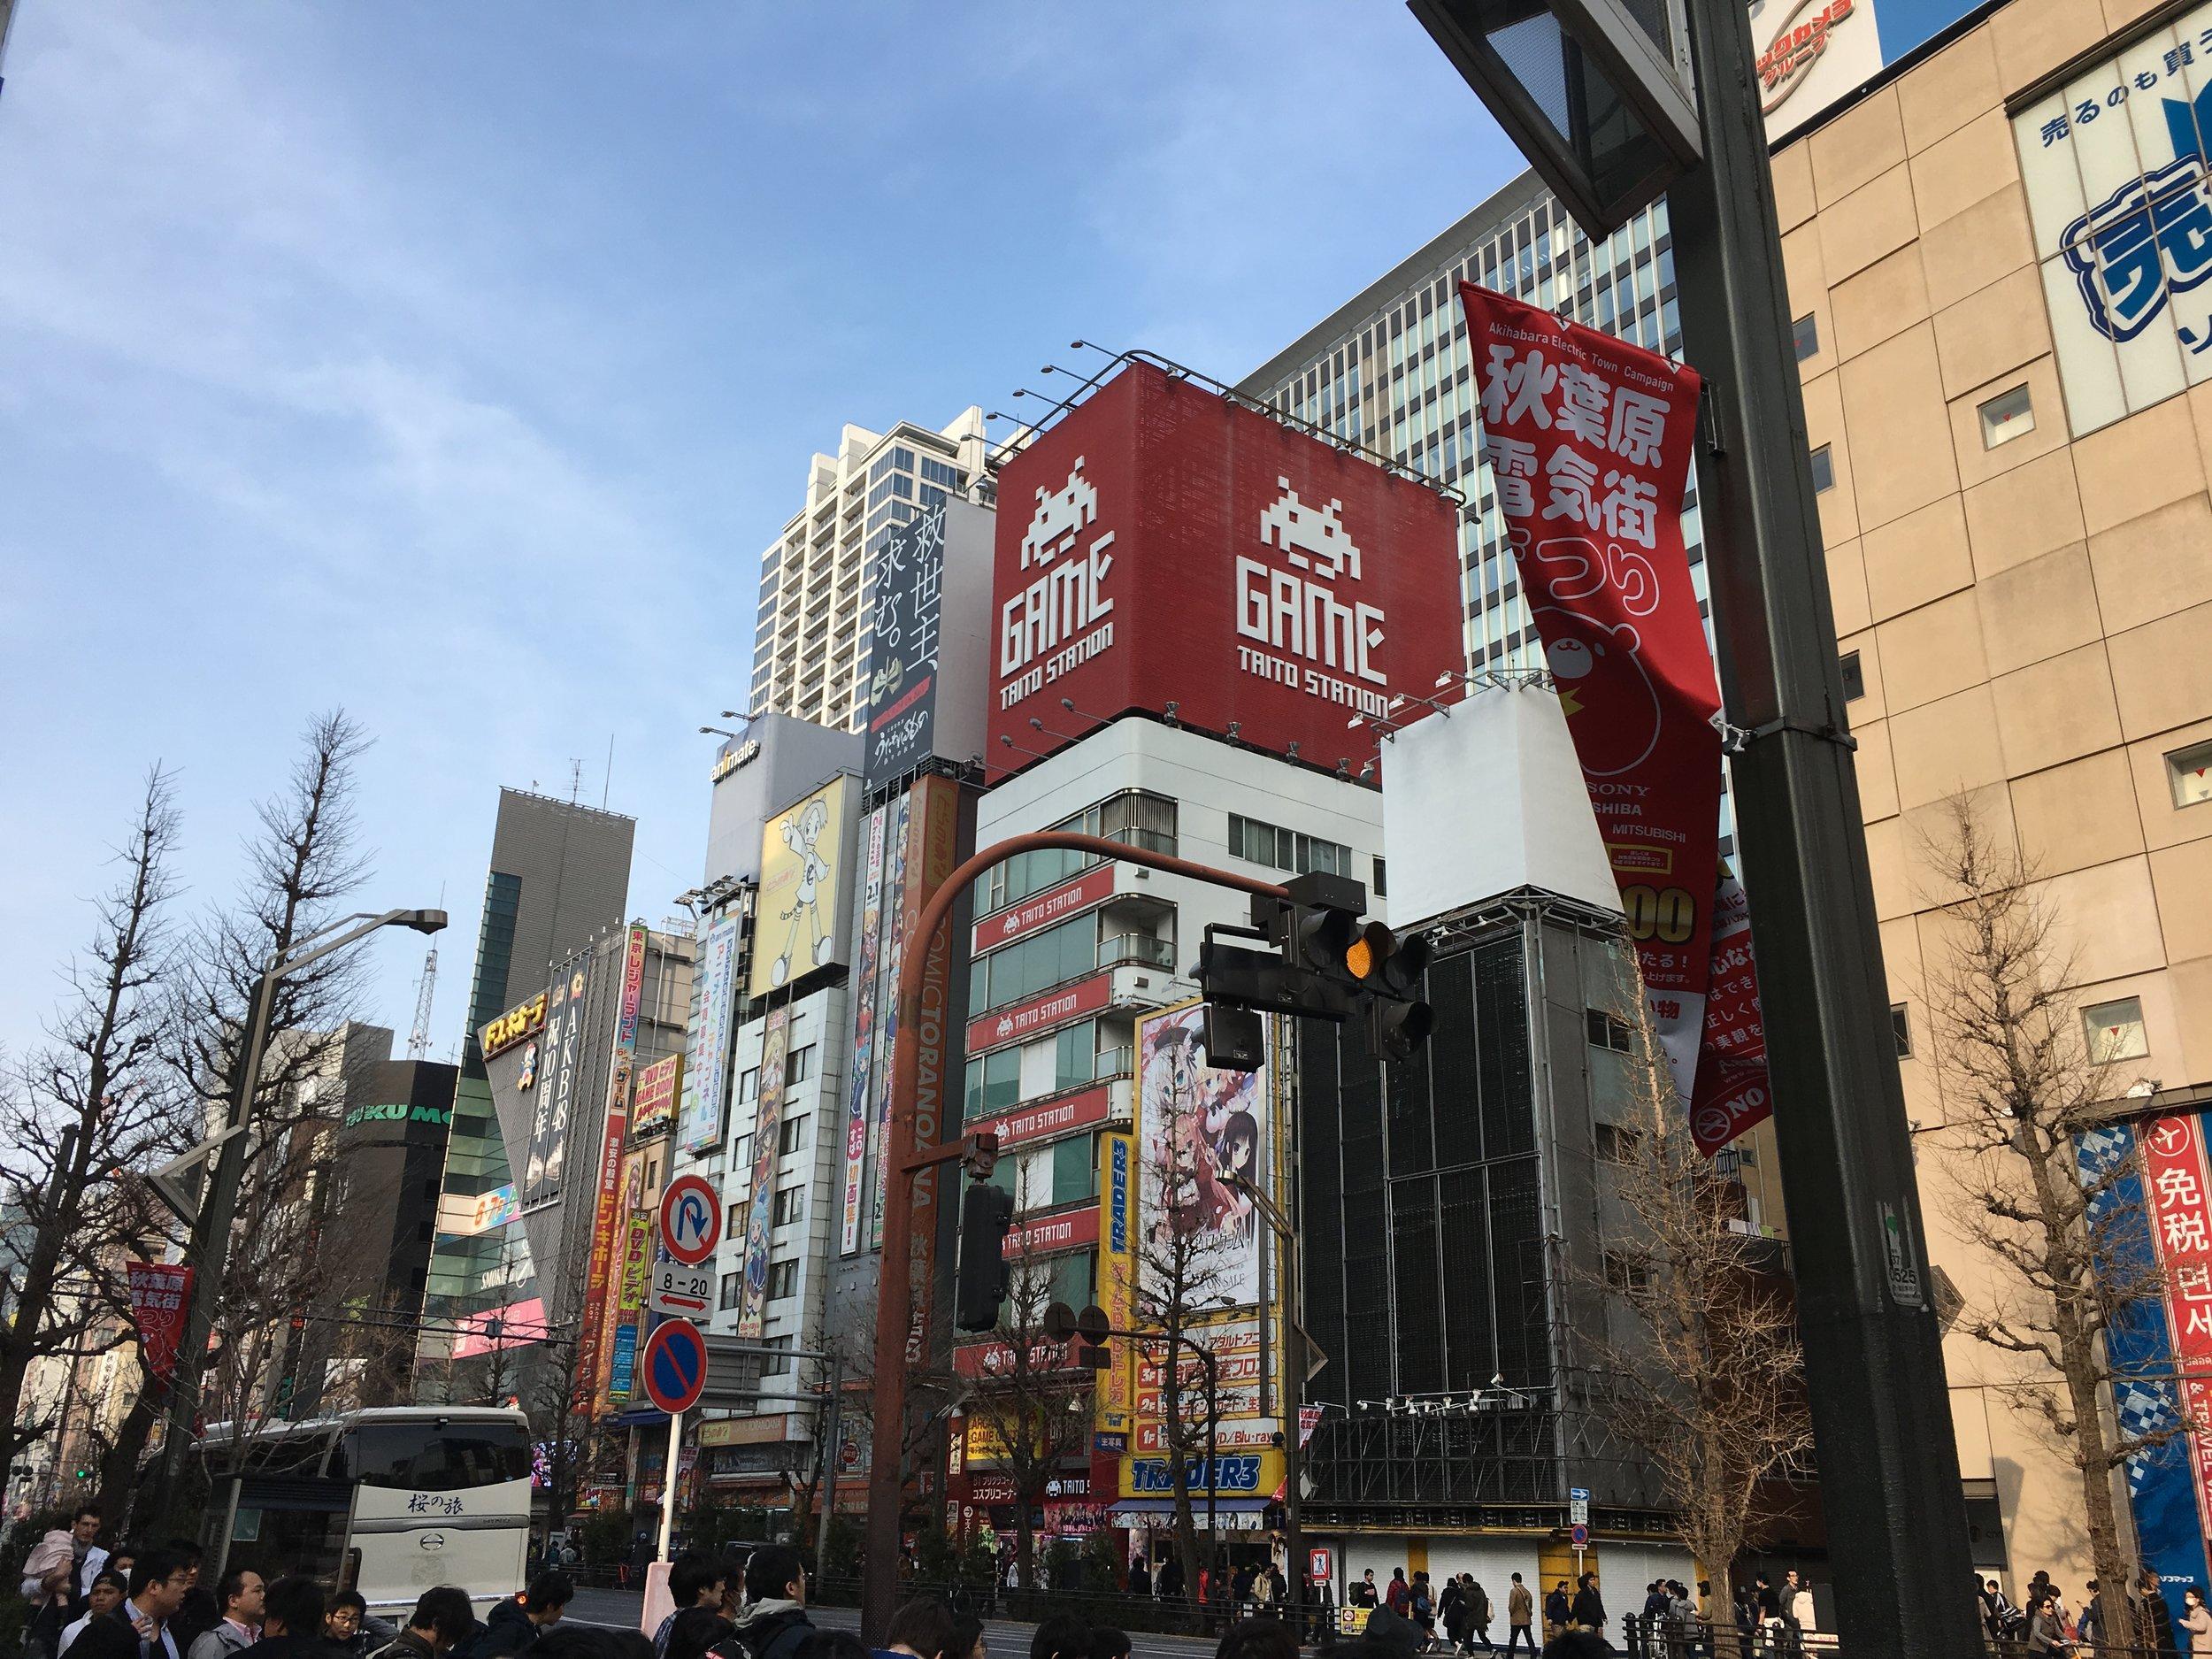 Day 7: Akihabara and Ghibli